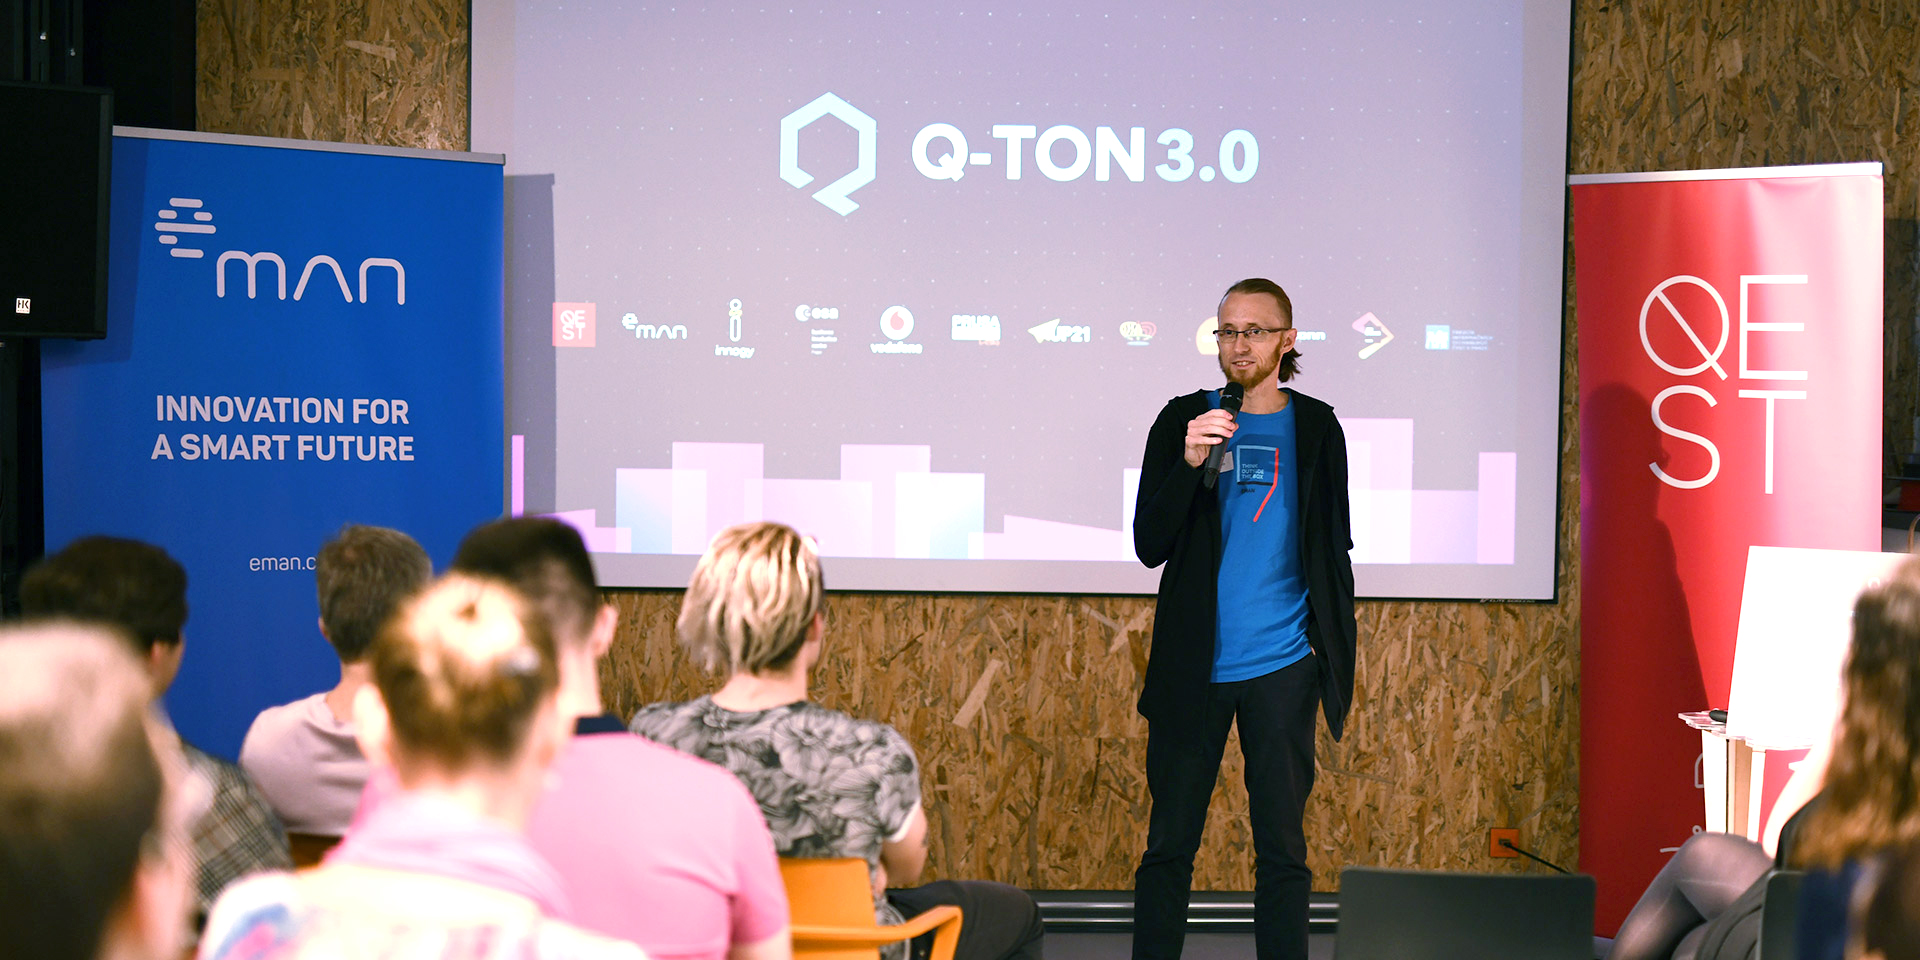 Hackathon Q-ton, eMan, Jiri Pech